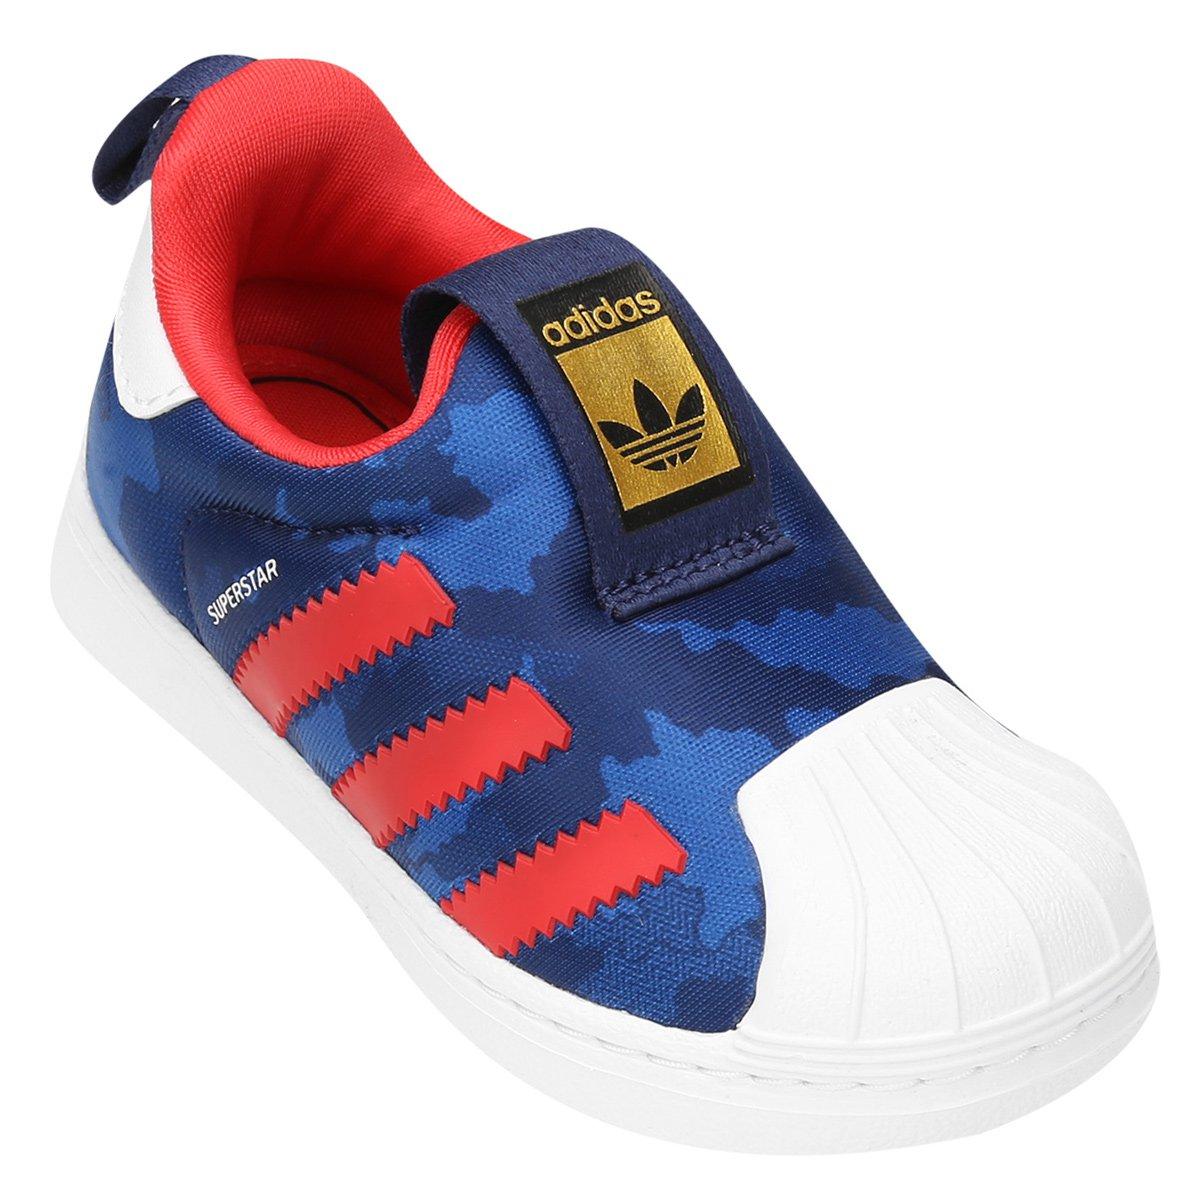 Tênis Infantil Adidas Superstar 360 l (18 ao 25)